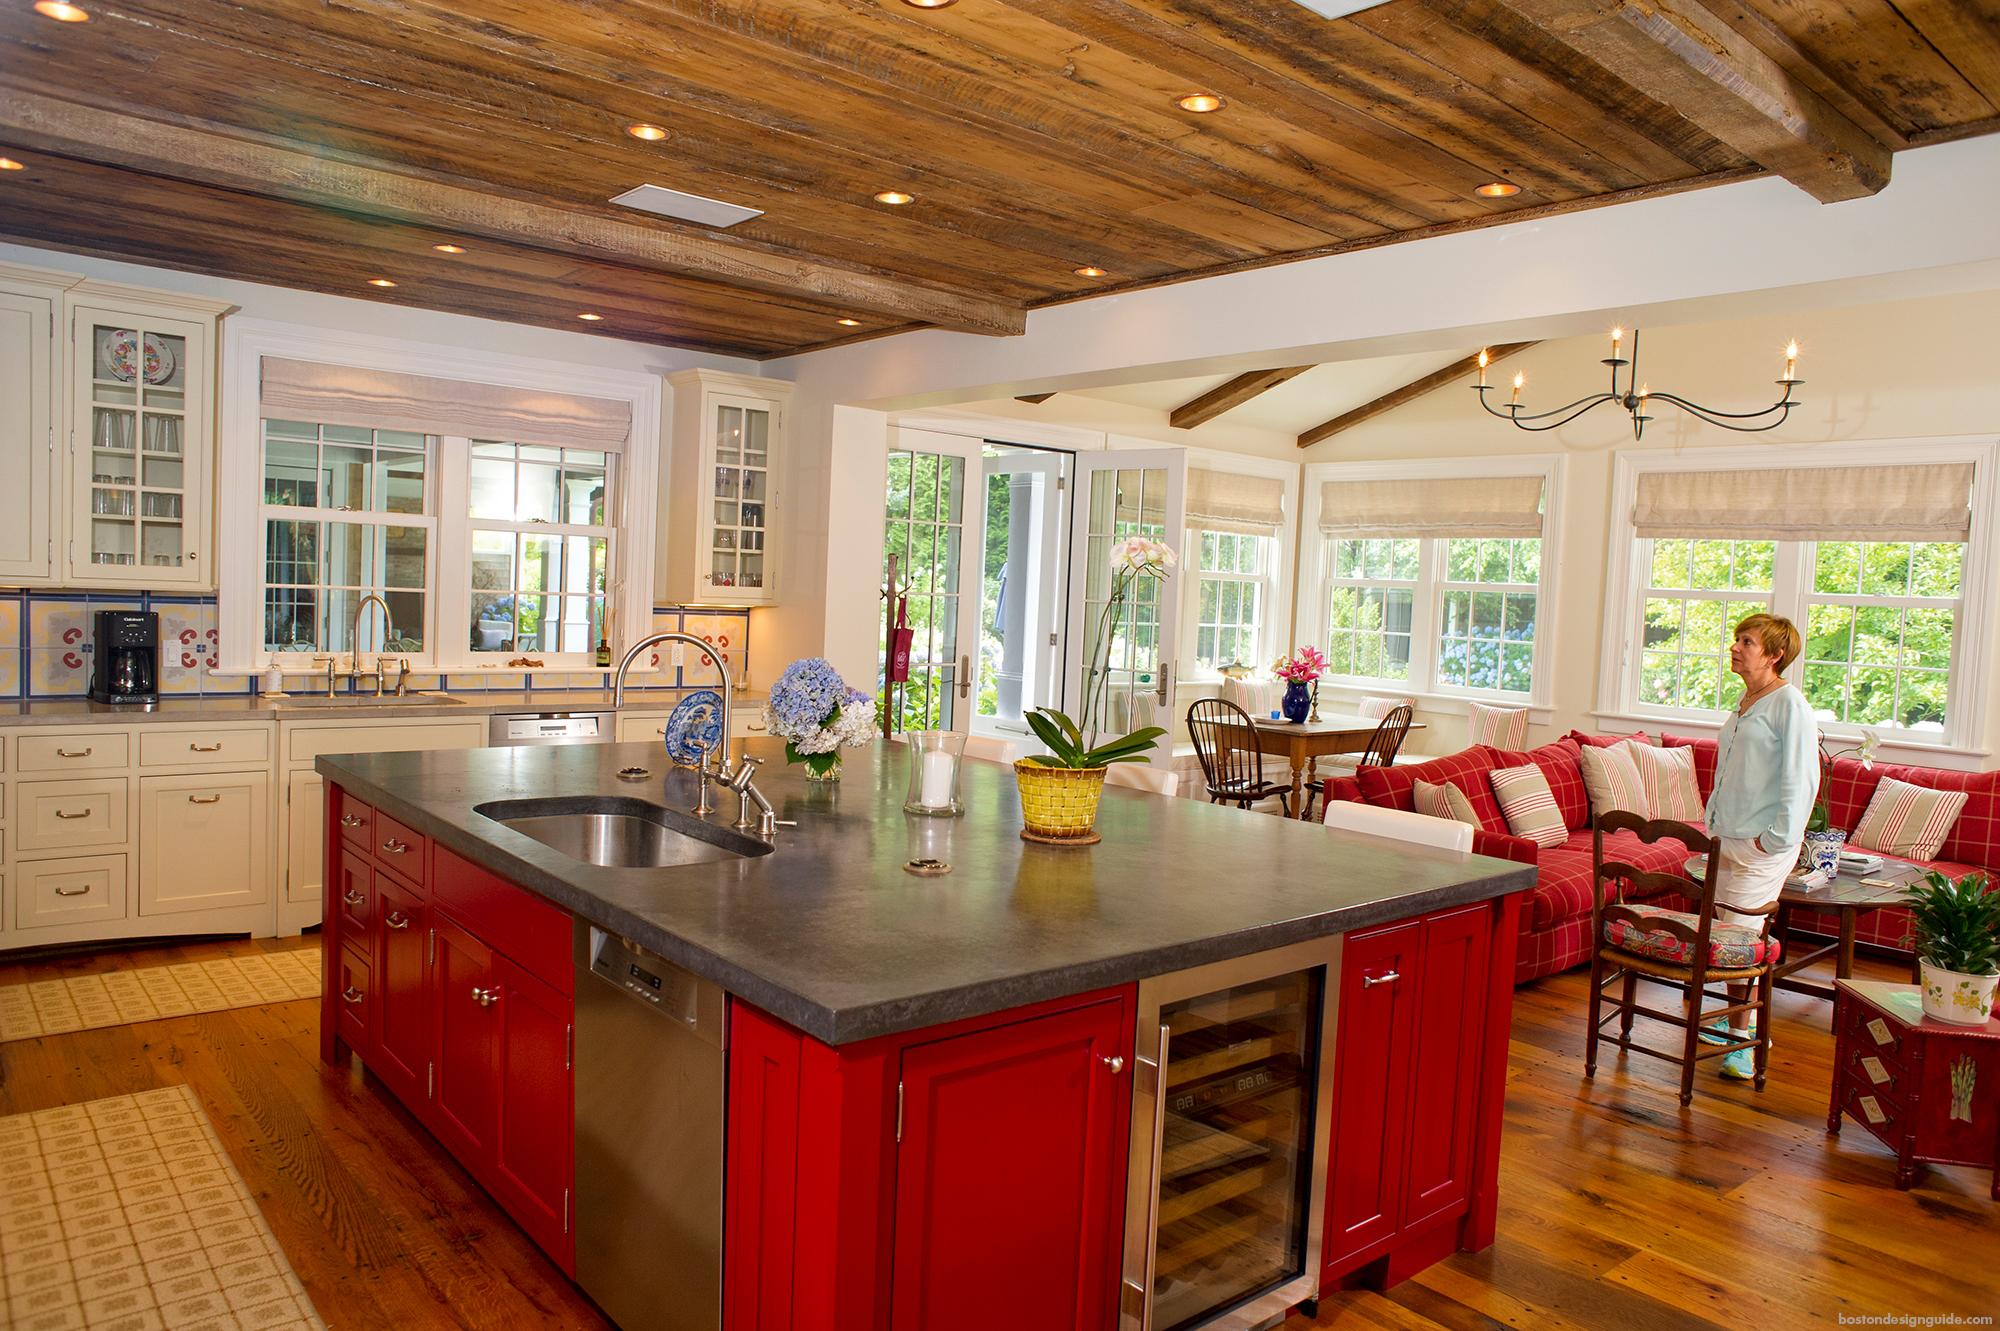 Kitchens on Martha's Vineyard